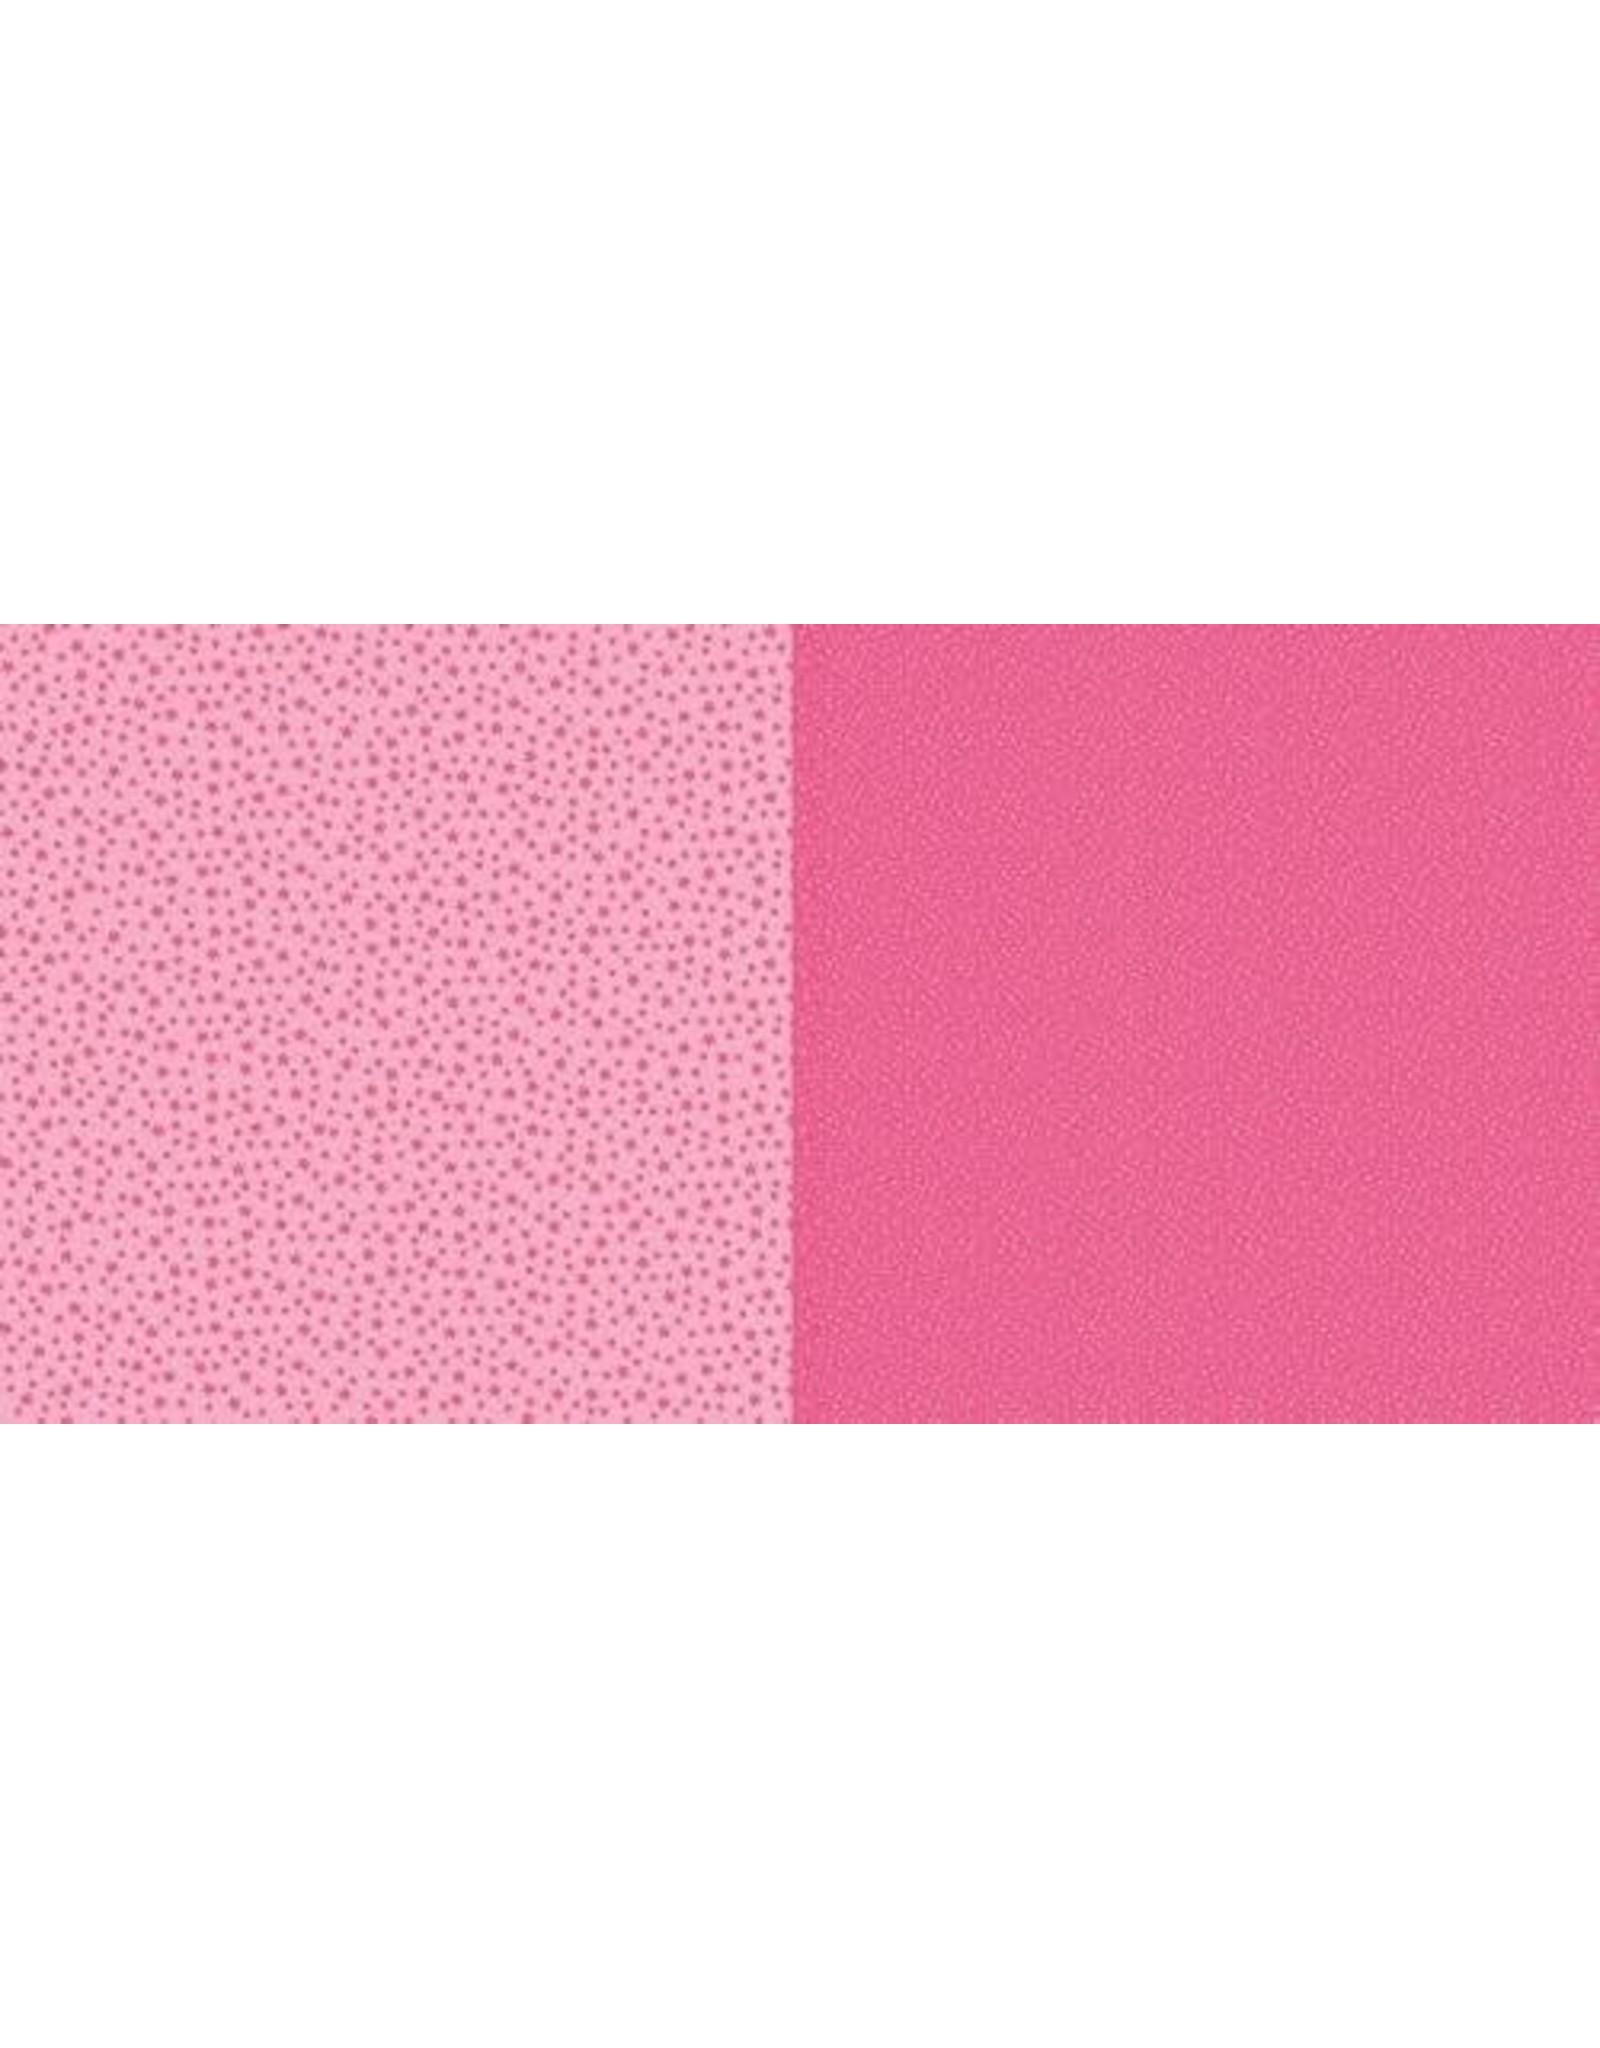 Craft Emotions Dini Design Scrappapier 10 vl Stippen bloemen - Watermeloen 30,5x30,5cm #2001